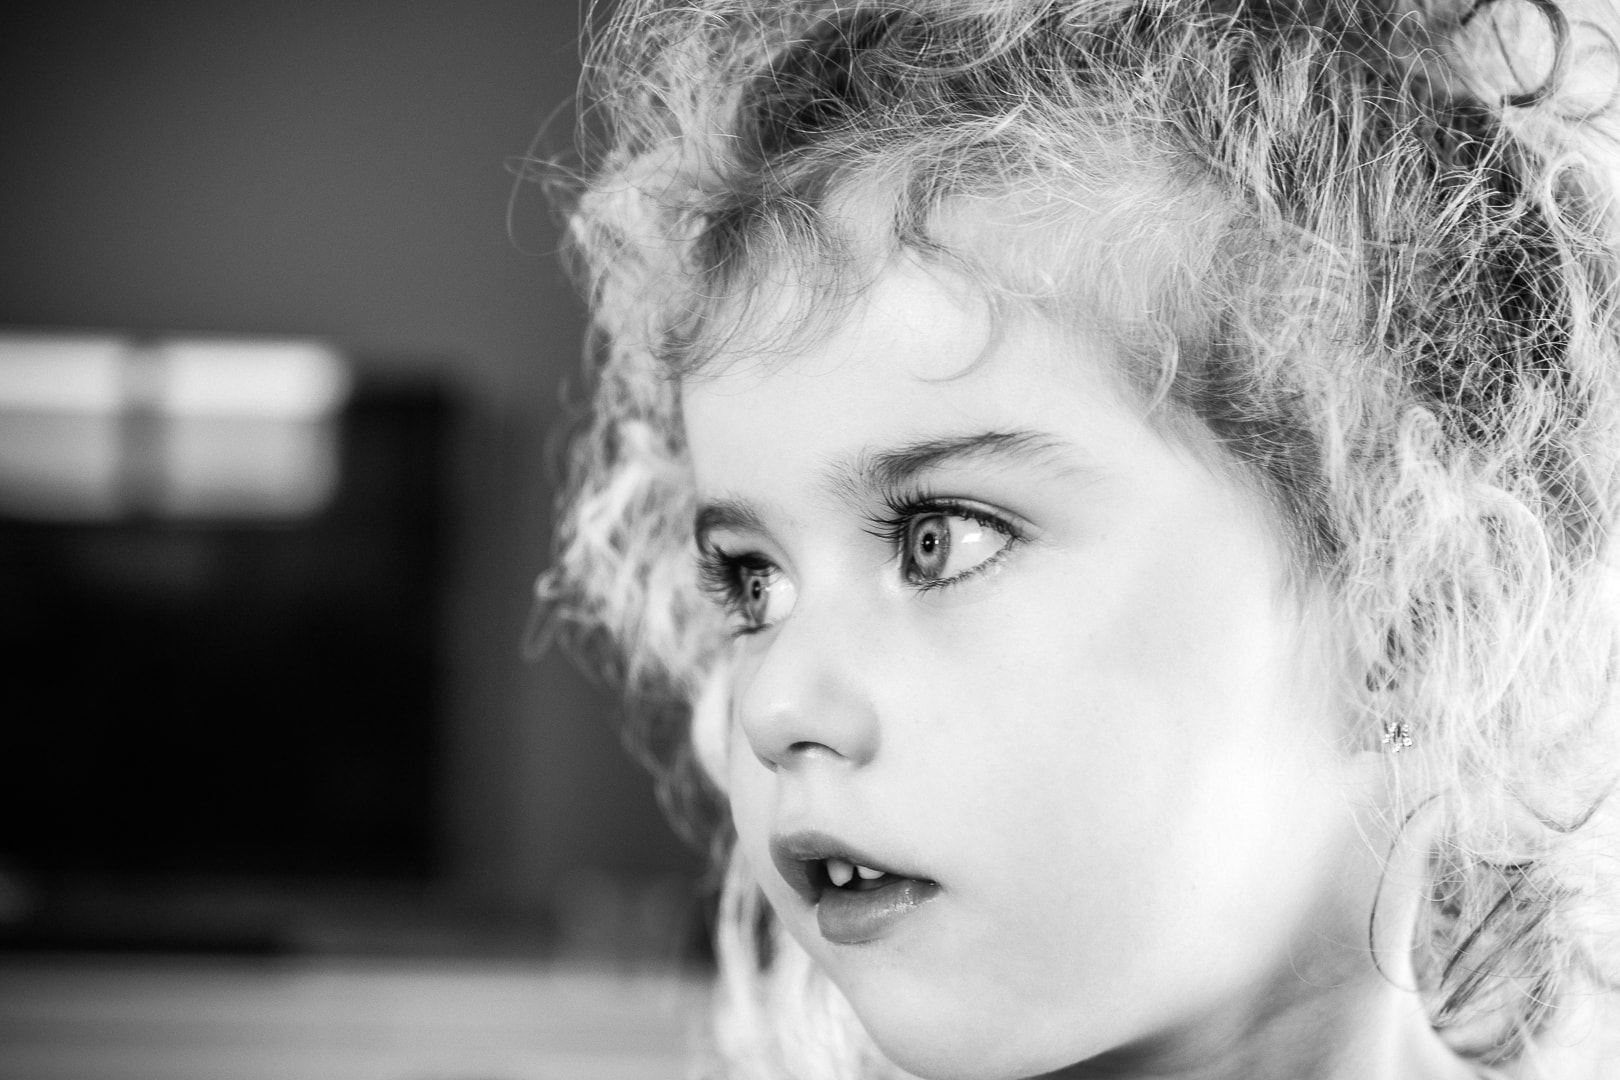 trezors-photography-photographe-professionnel-toulouse-31-enfance-seance-famille-lifestyle (13)